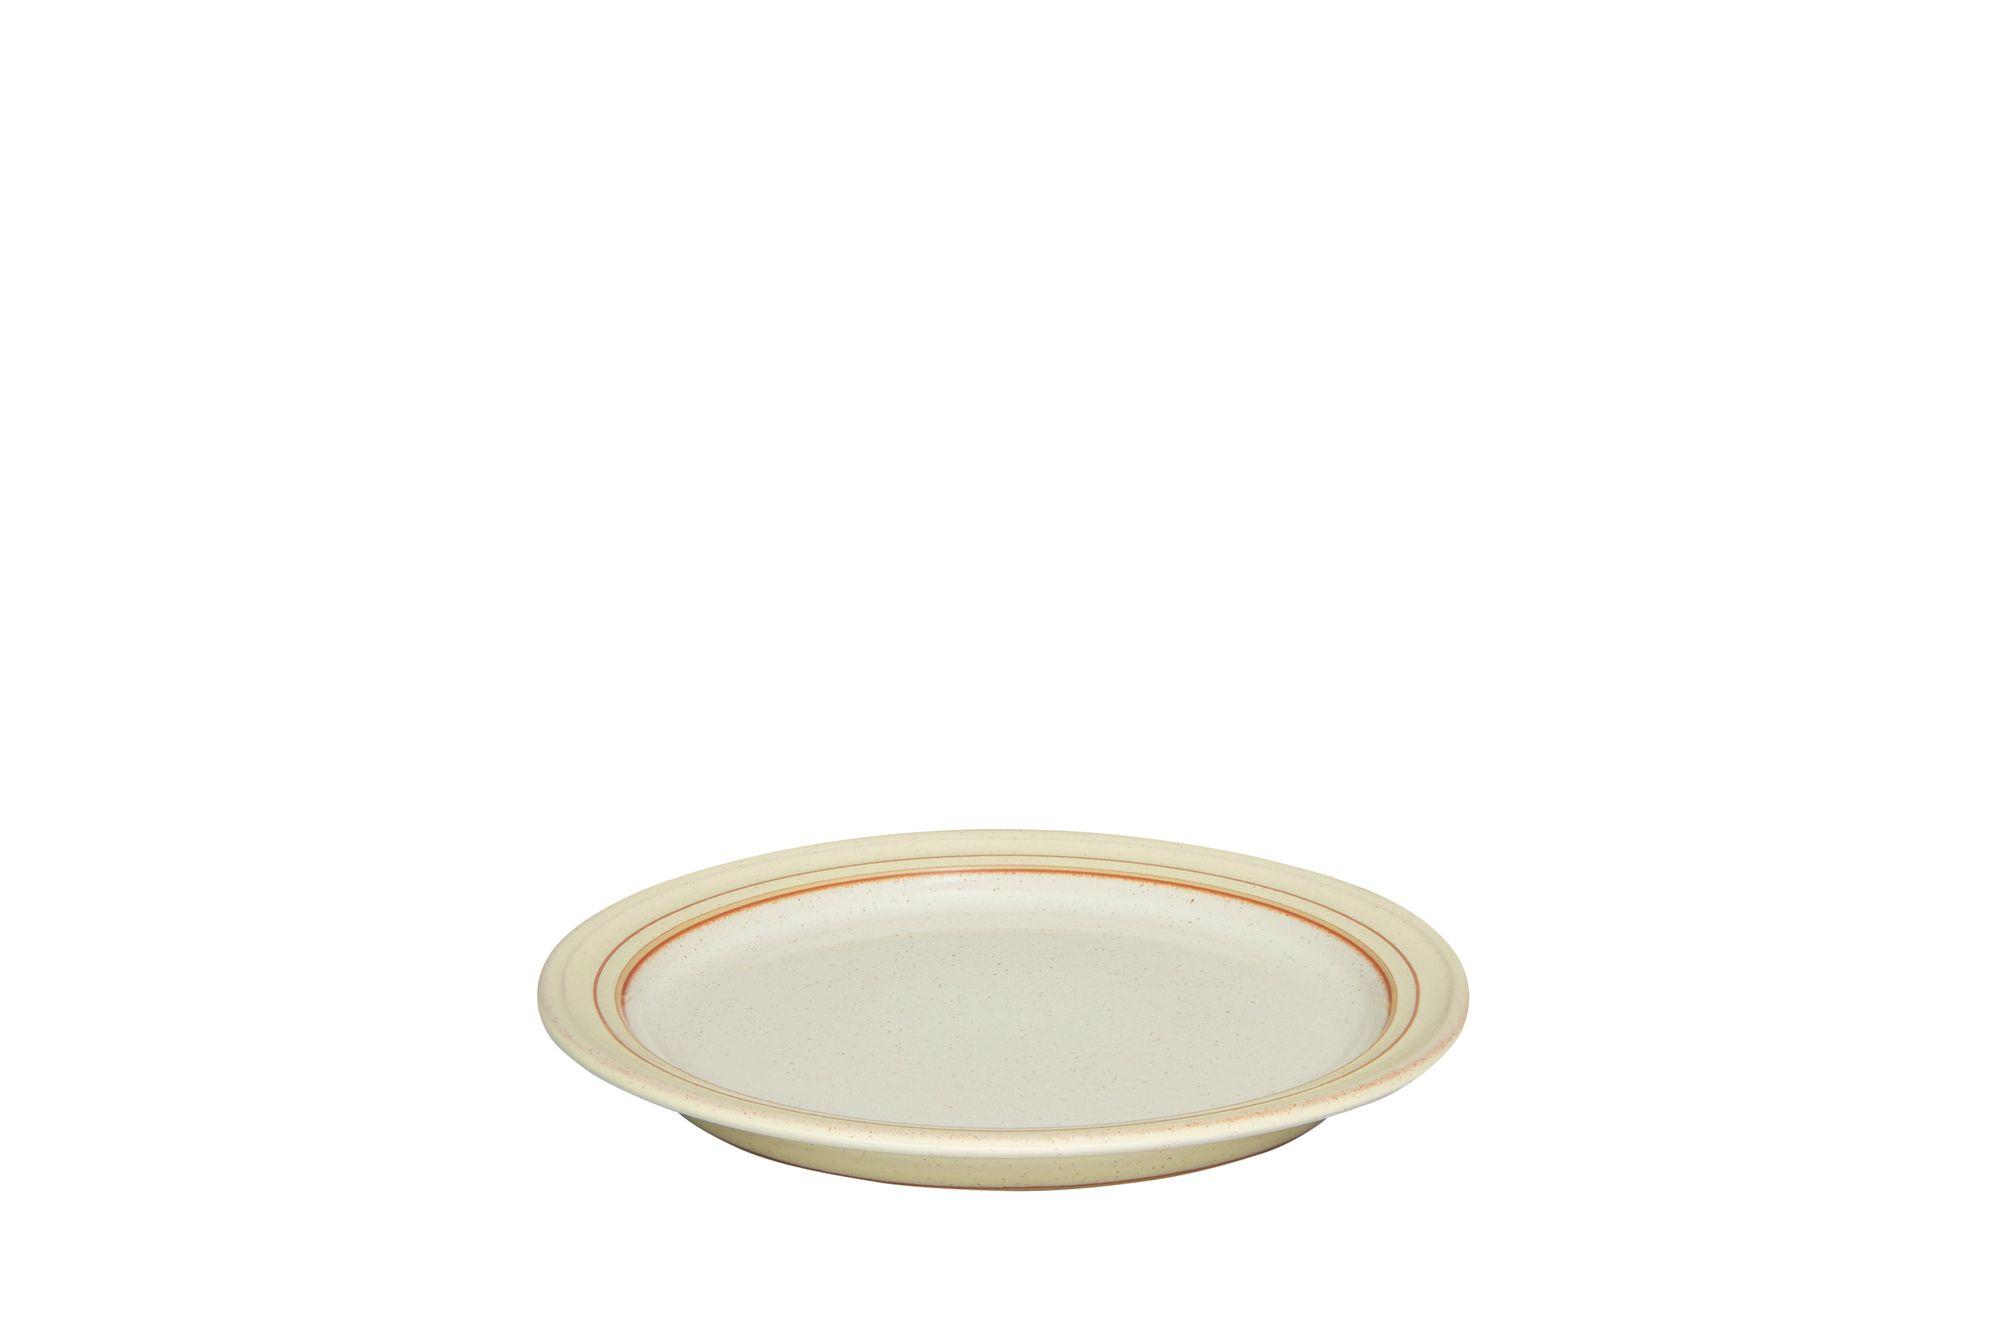 Denby Heritage Veranda Tea Plate 18cm thumb 2